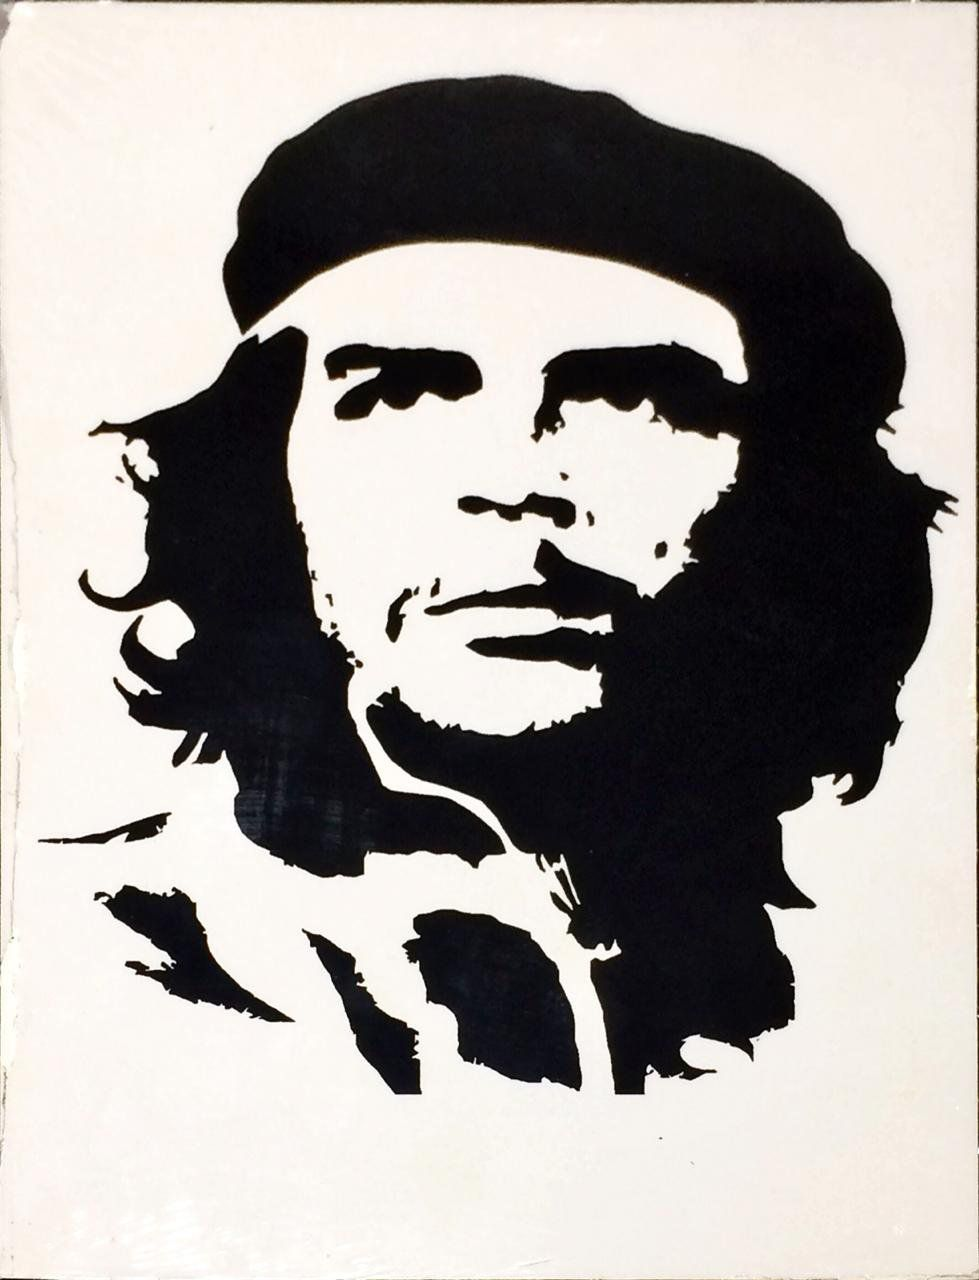 Placa Decorativa: Che Guevara